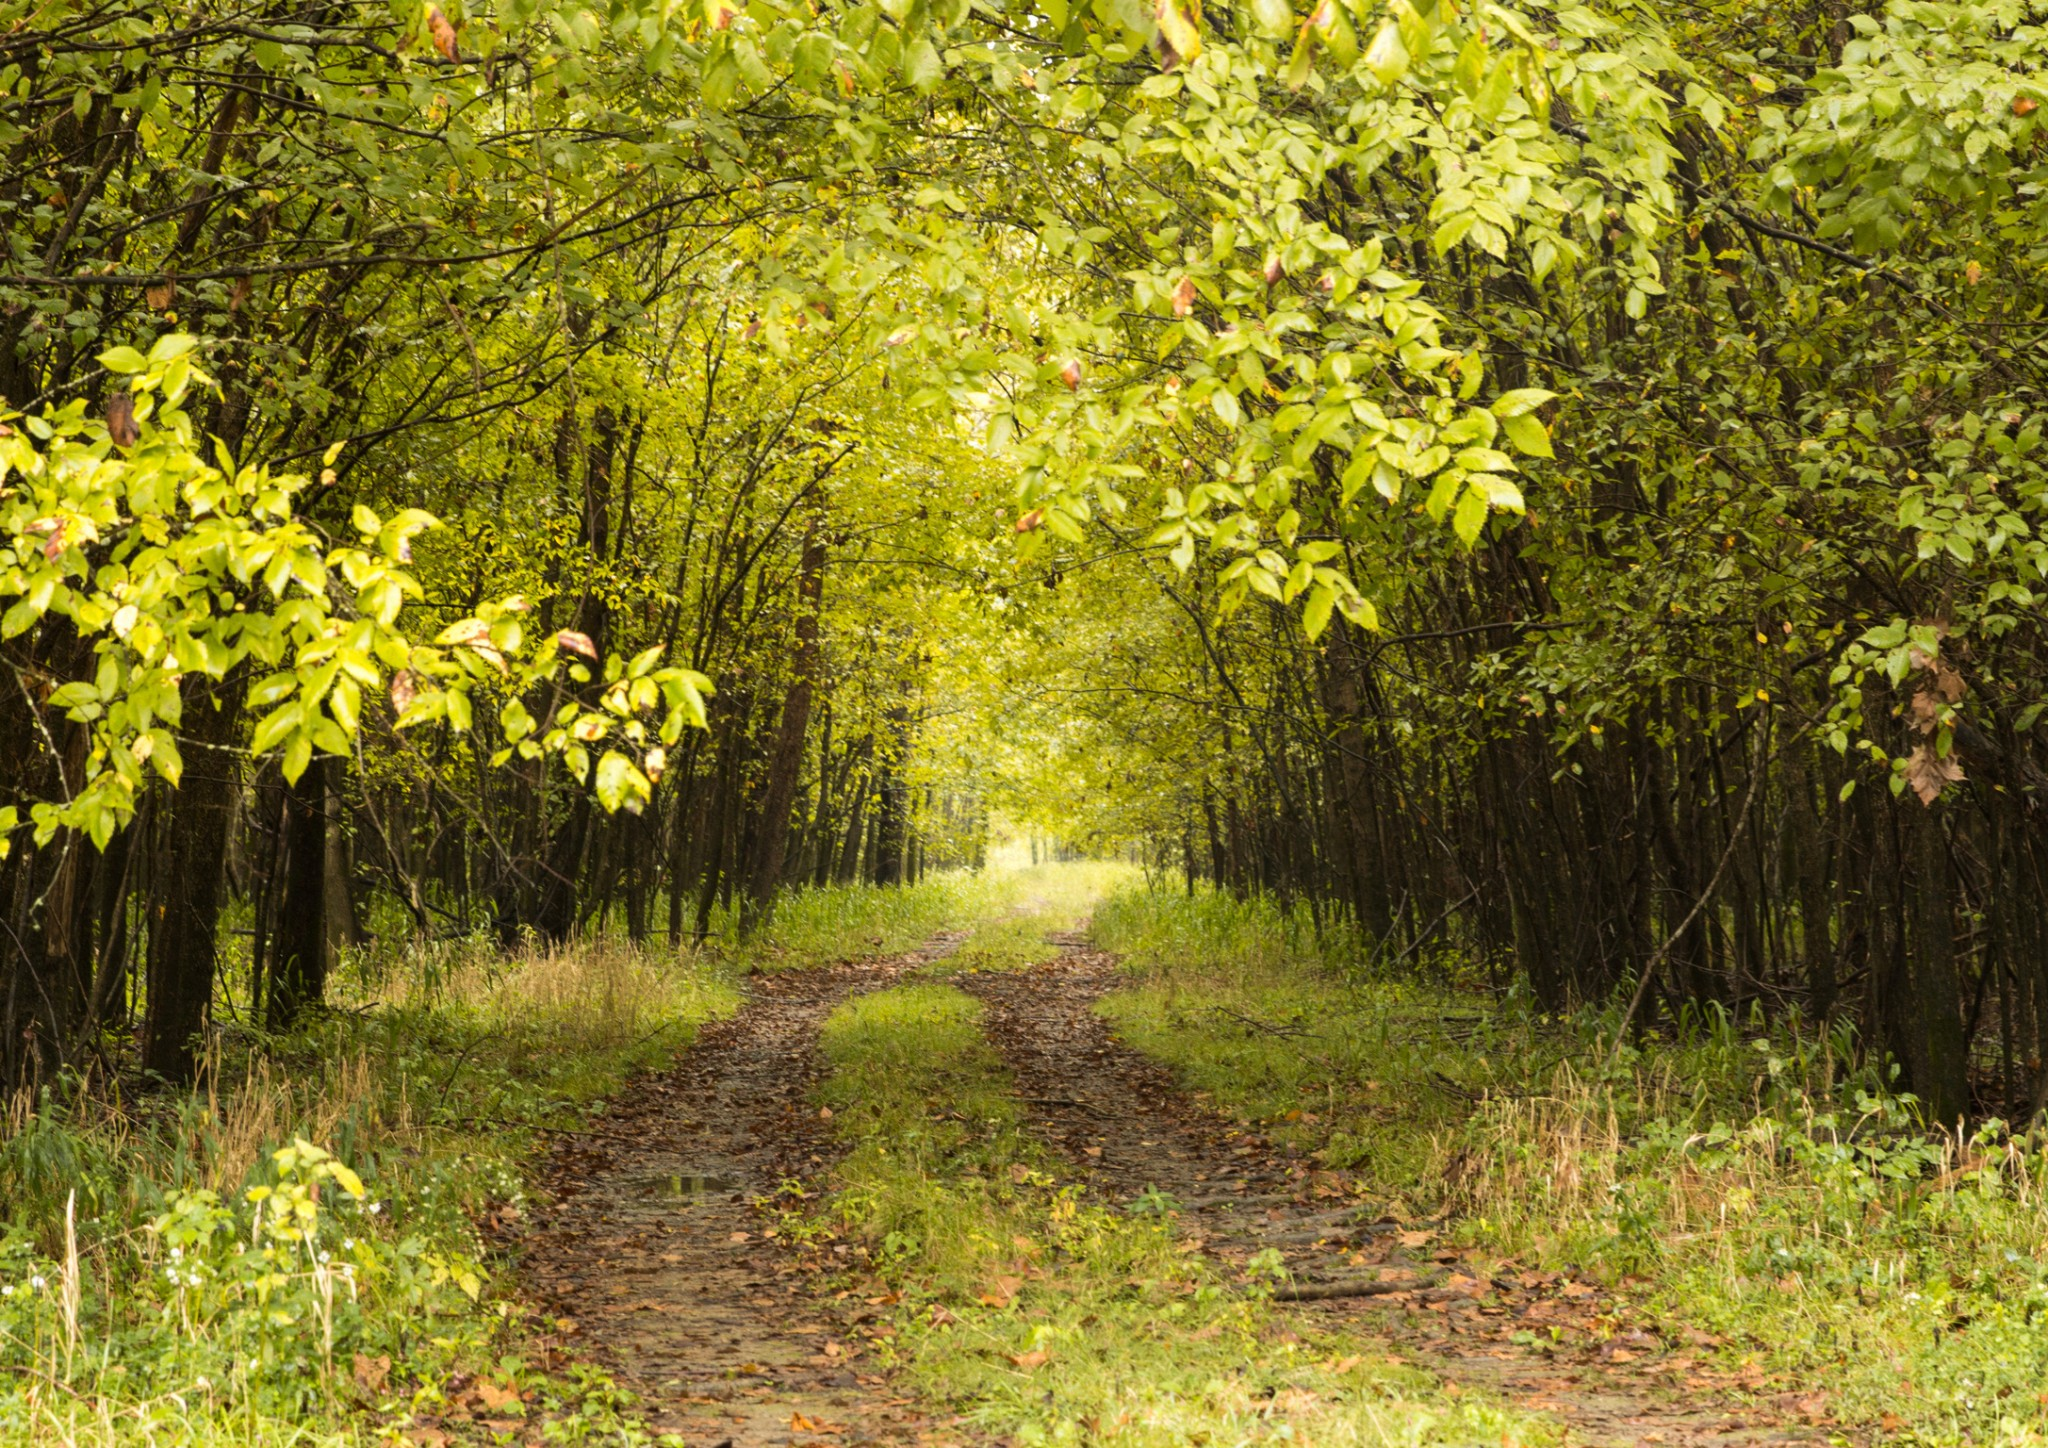 279 Ridgeway Dr Property Photo - Sugar Tree, TN real estate listing